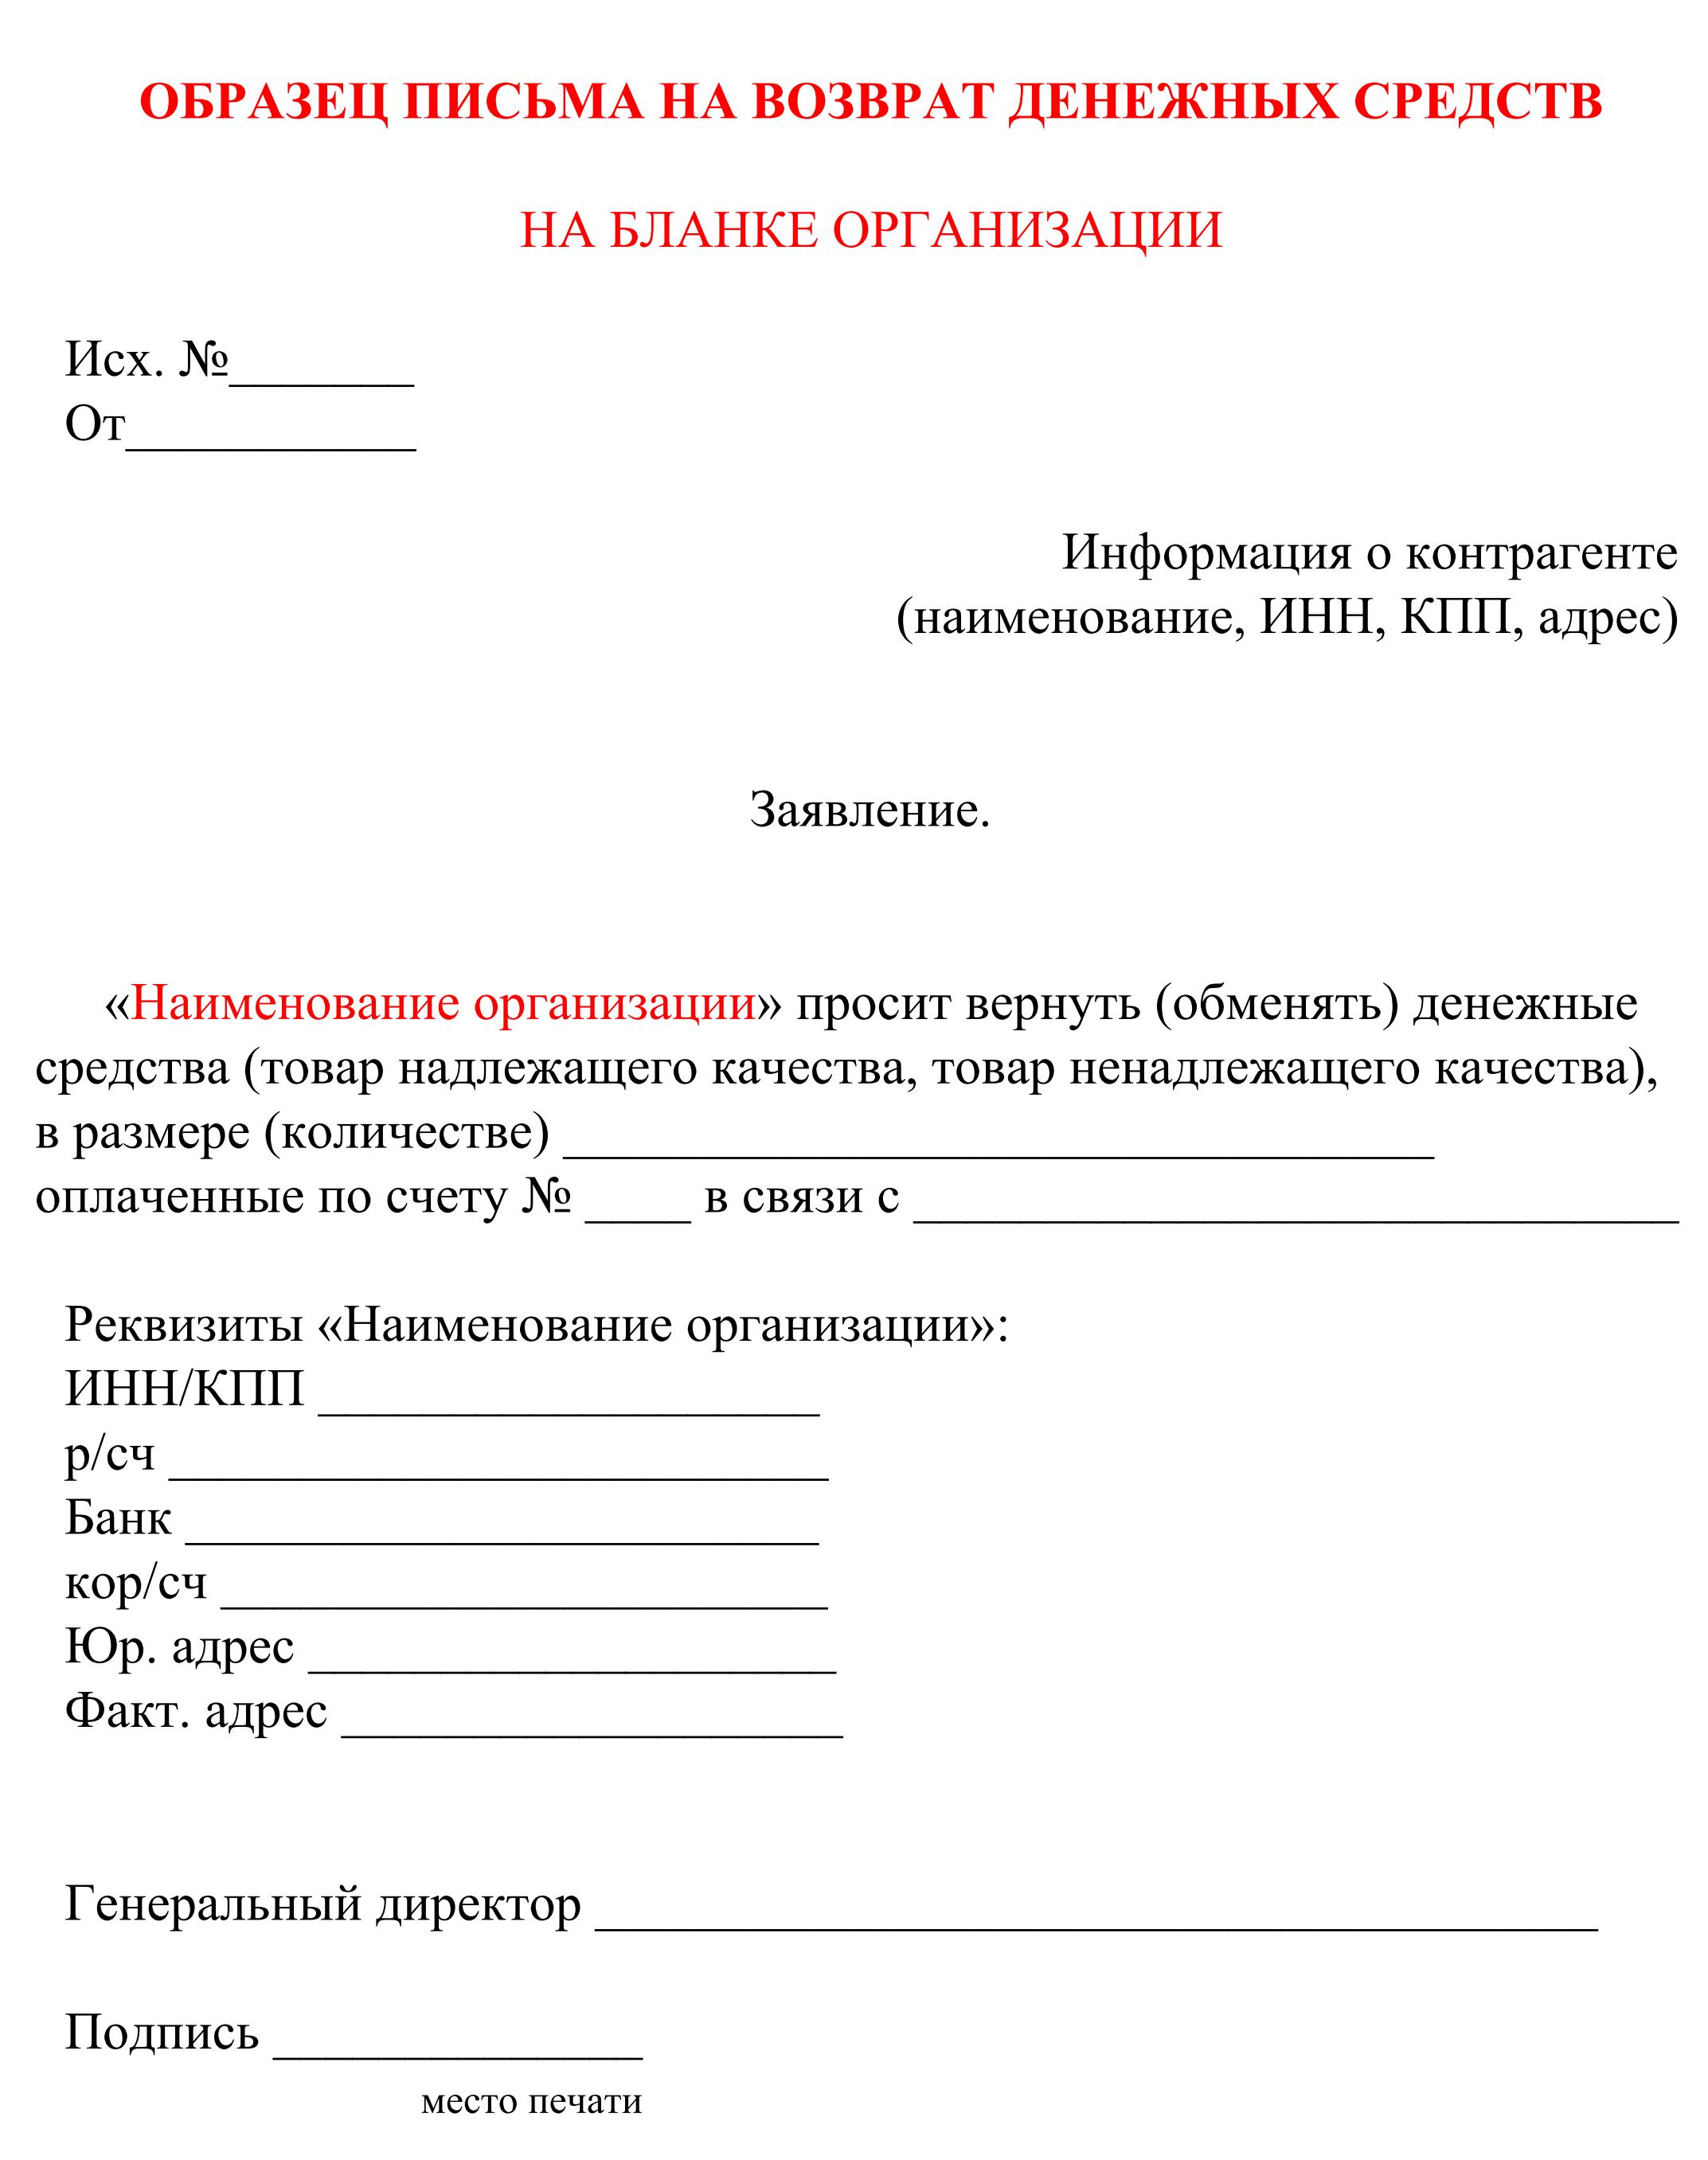 письмо просьба займа заявка кредит на погашения кредита